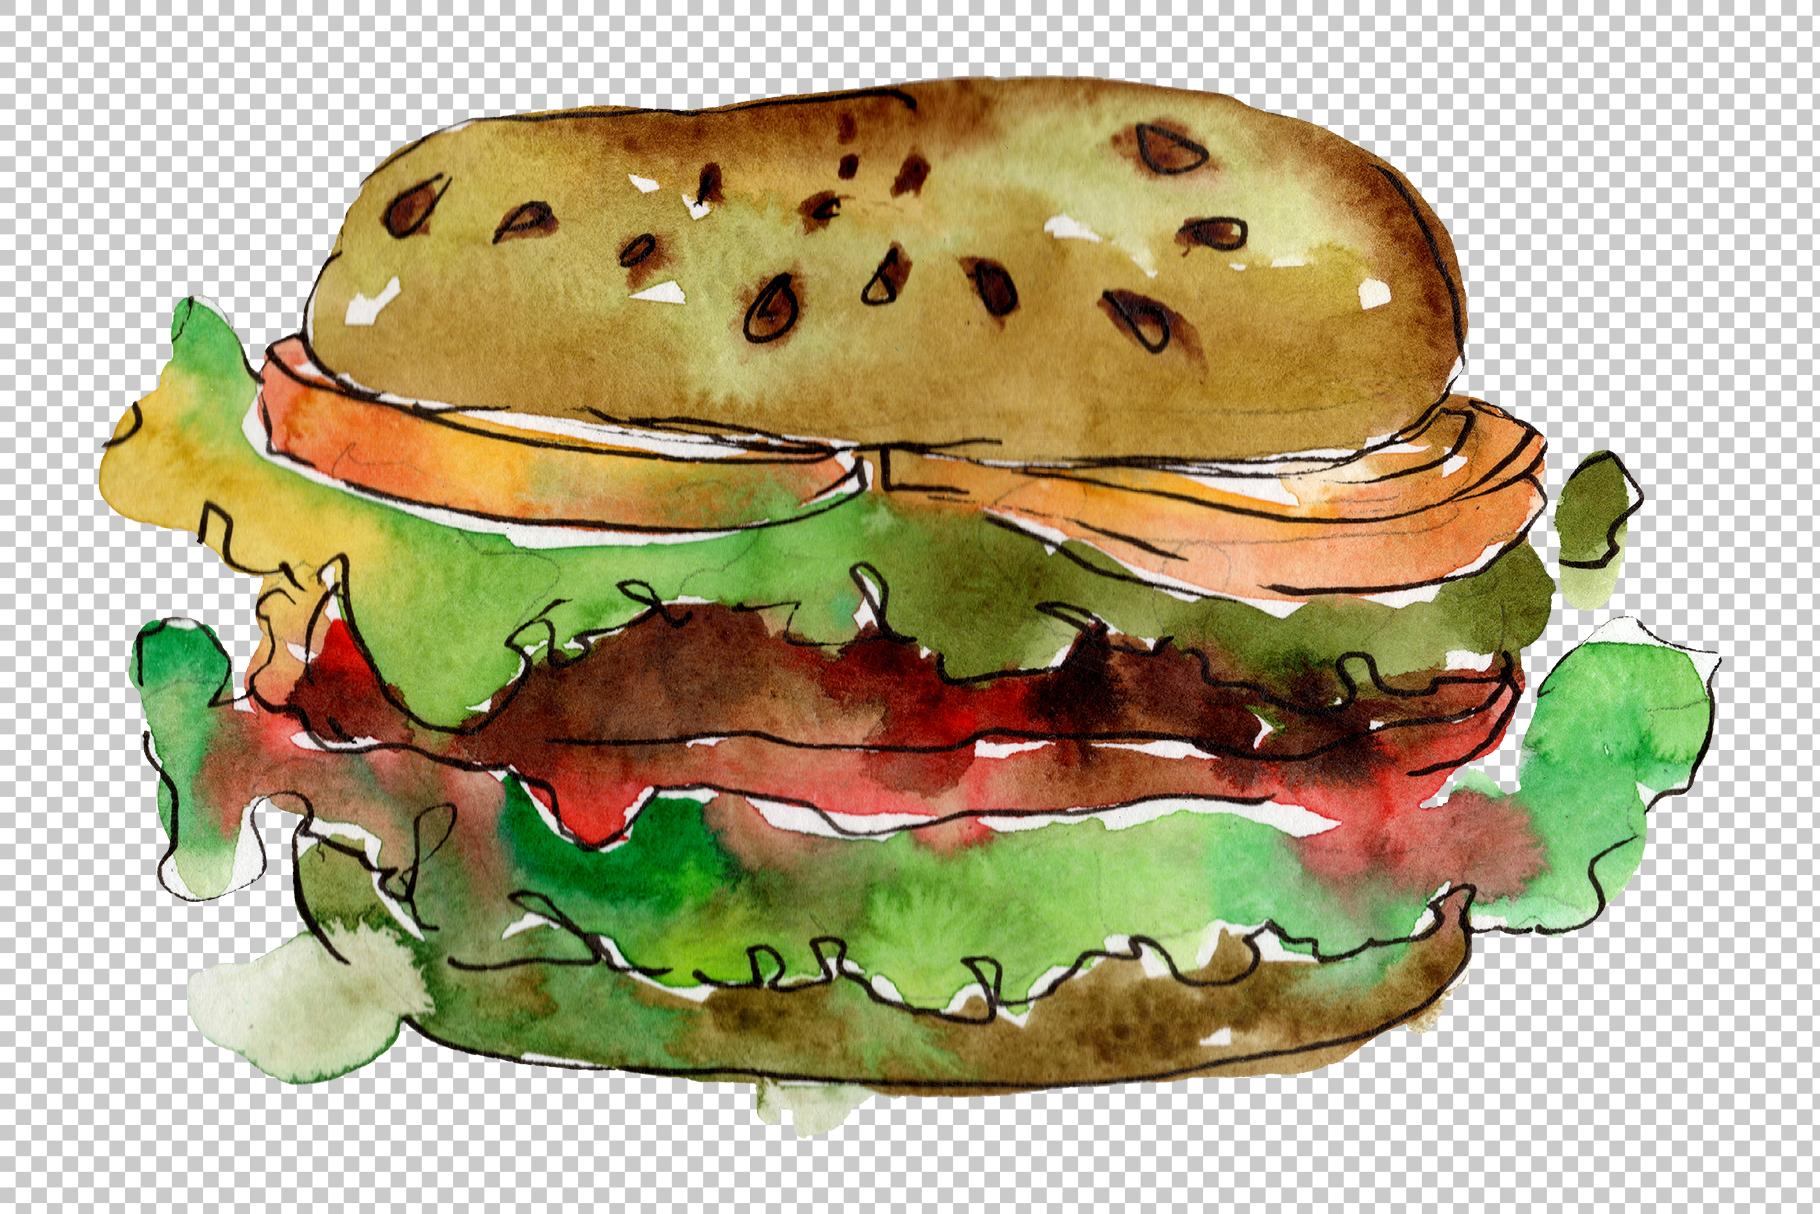 European Hamburger Watercolor png example image 6